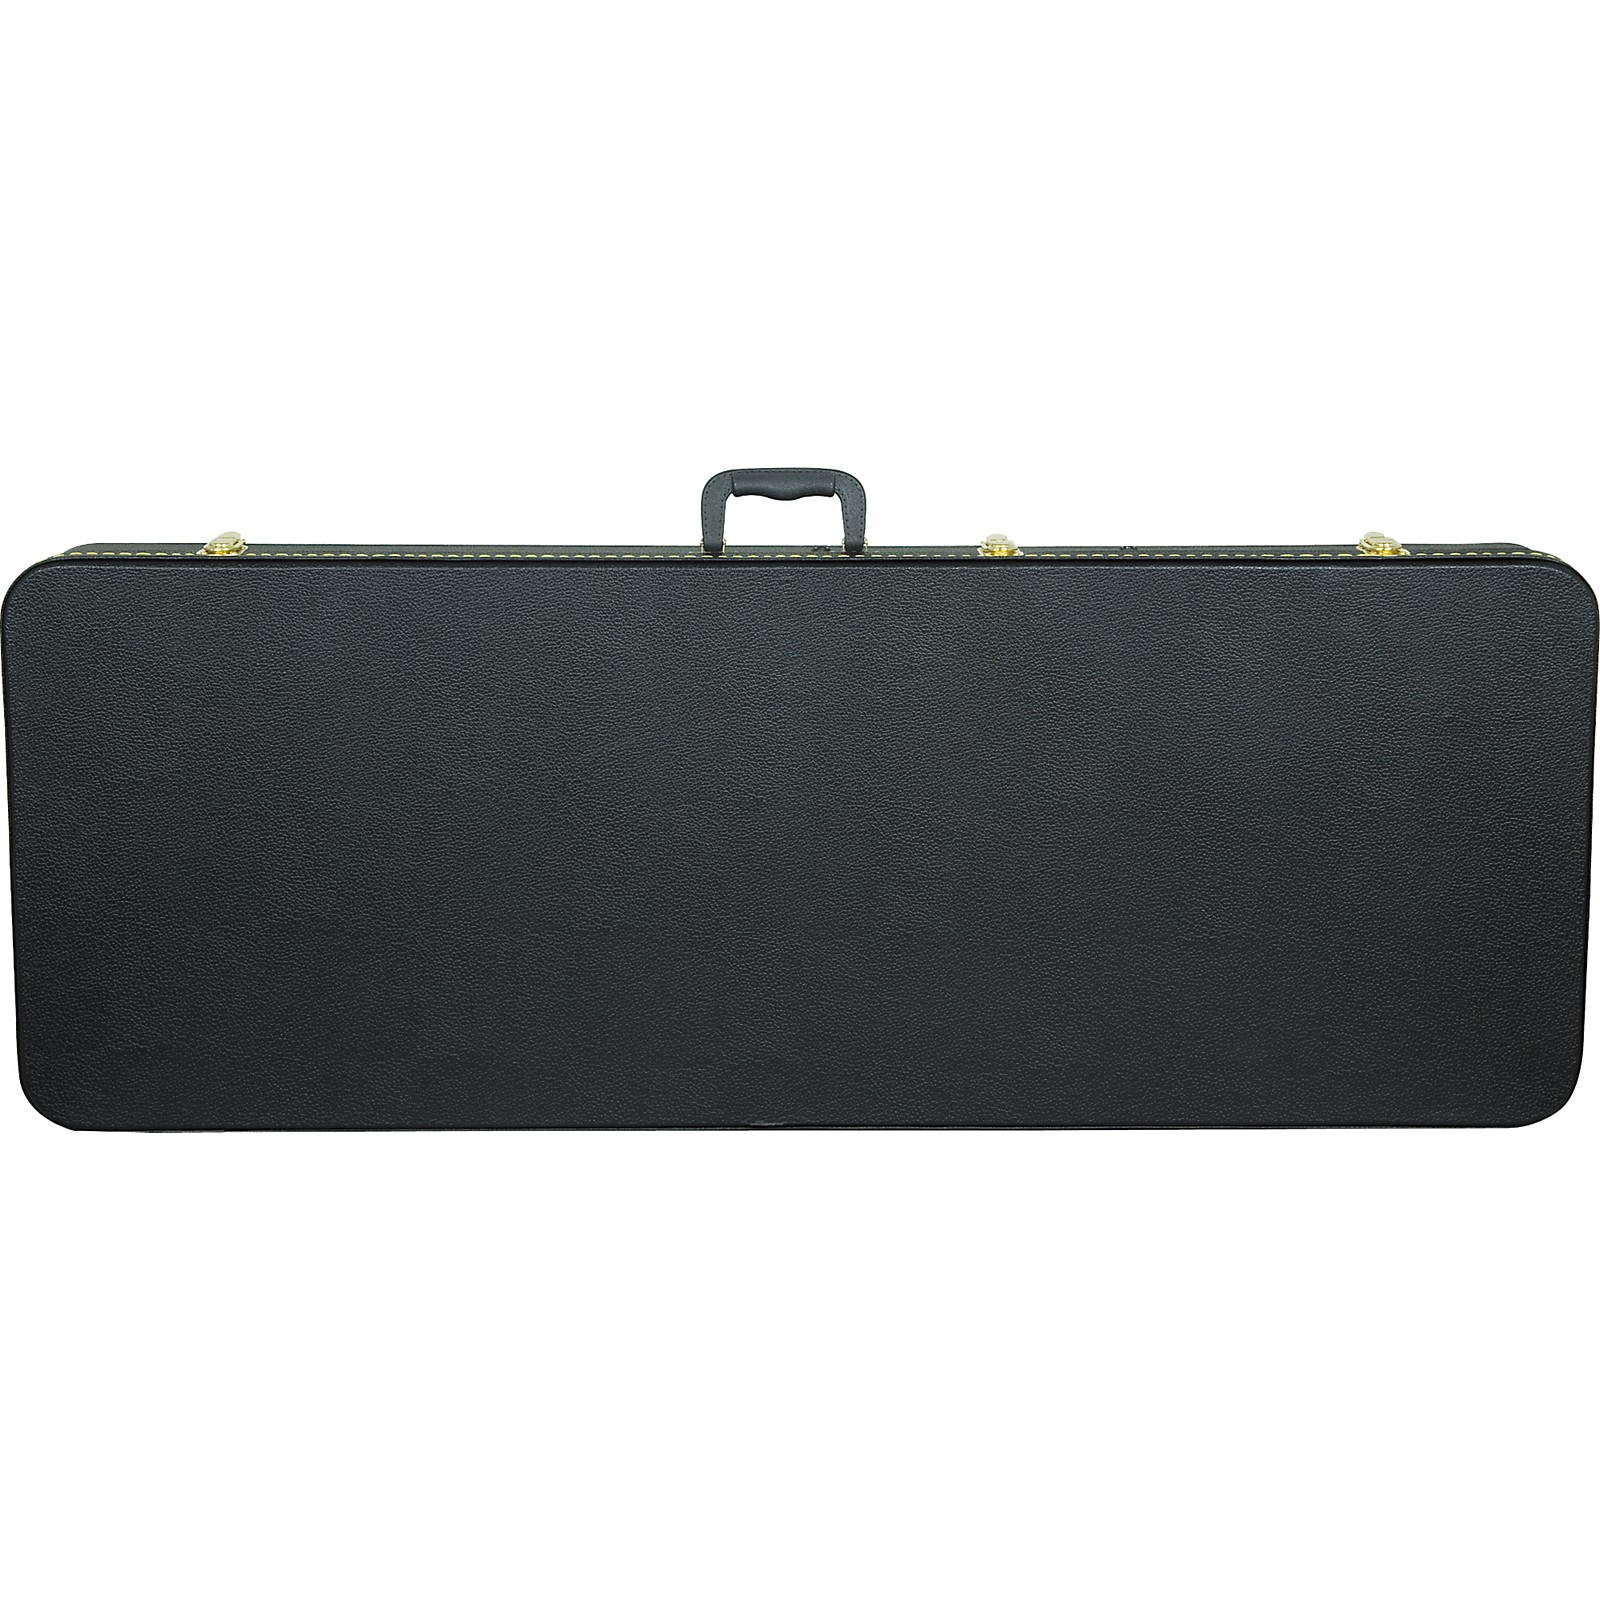 Musician's Gear EXP-Style Guitar Case